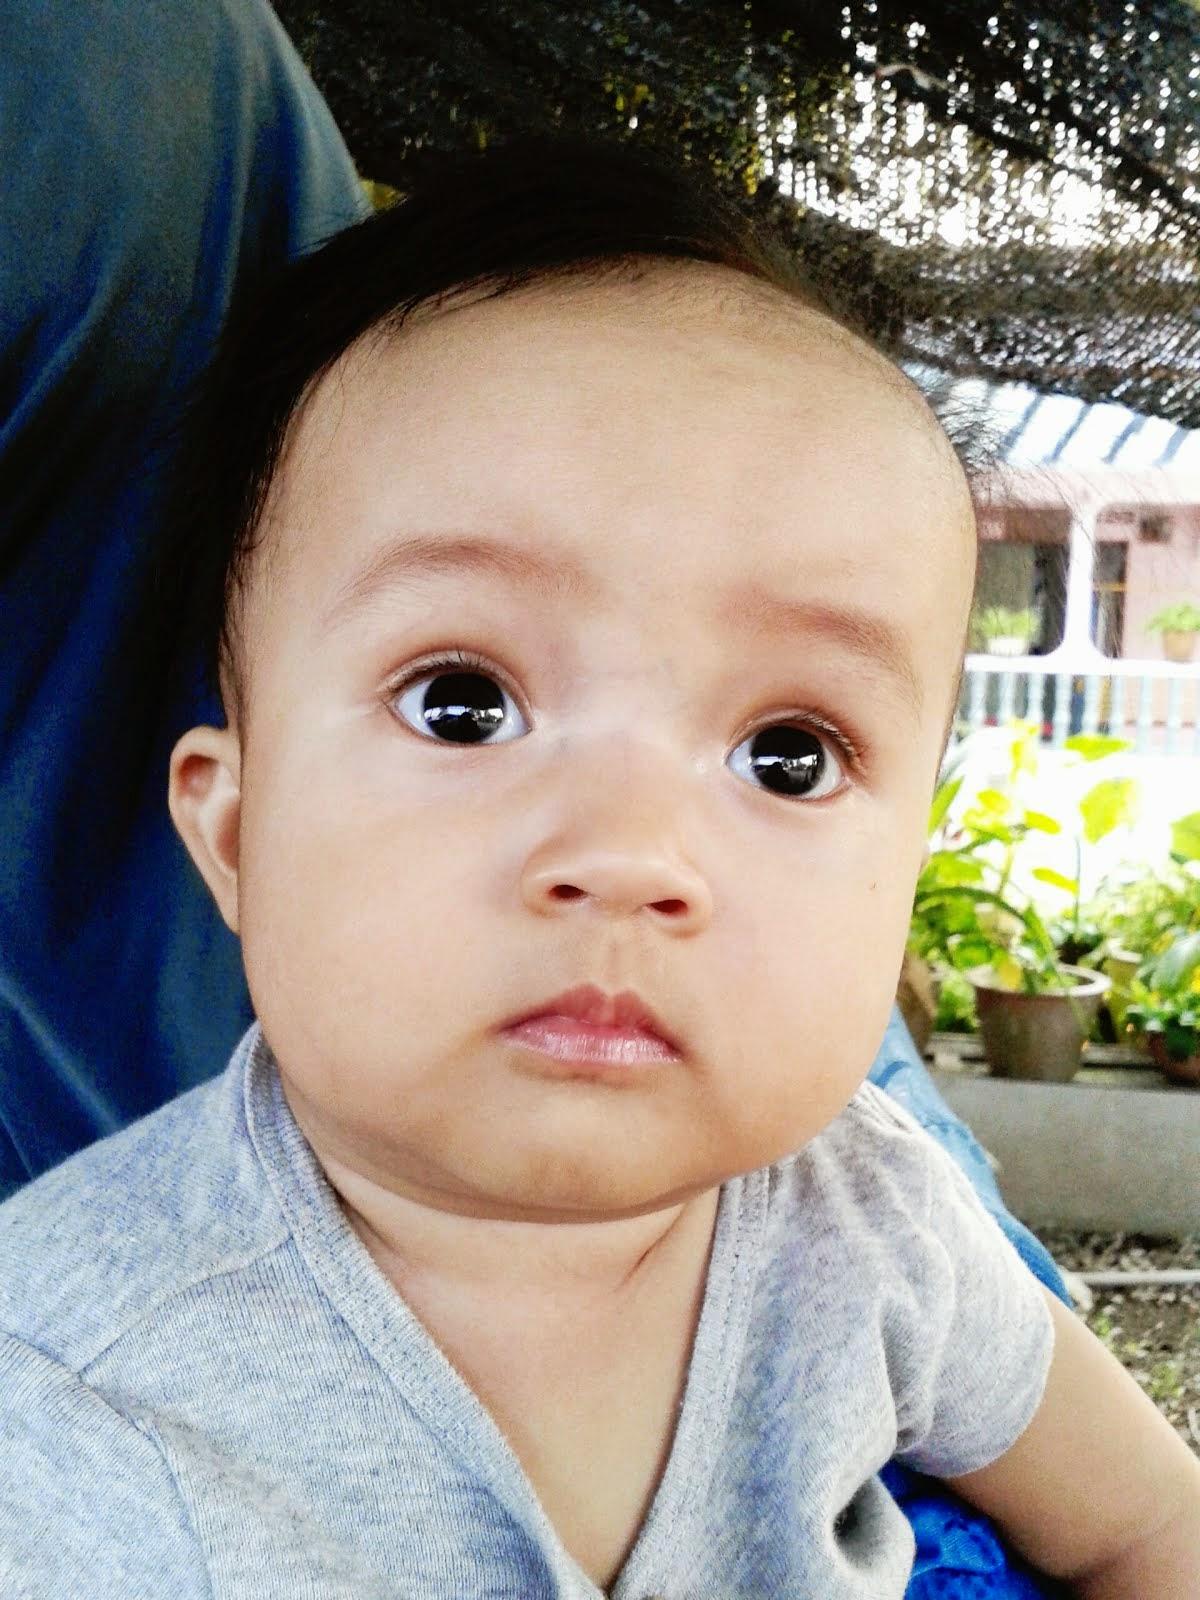 Raifa Evaqaleefa Binti Saiful Bahtiar